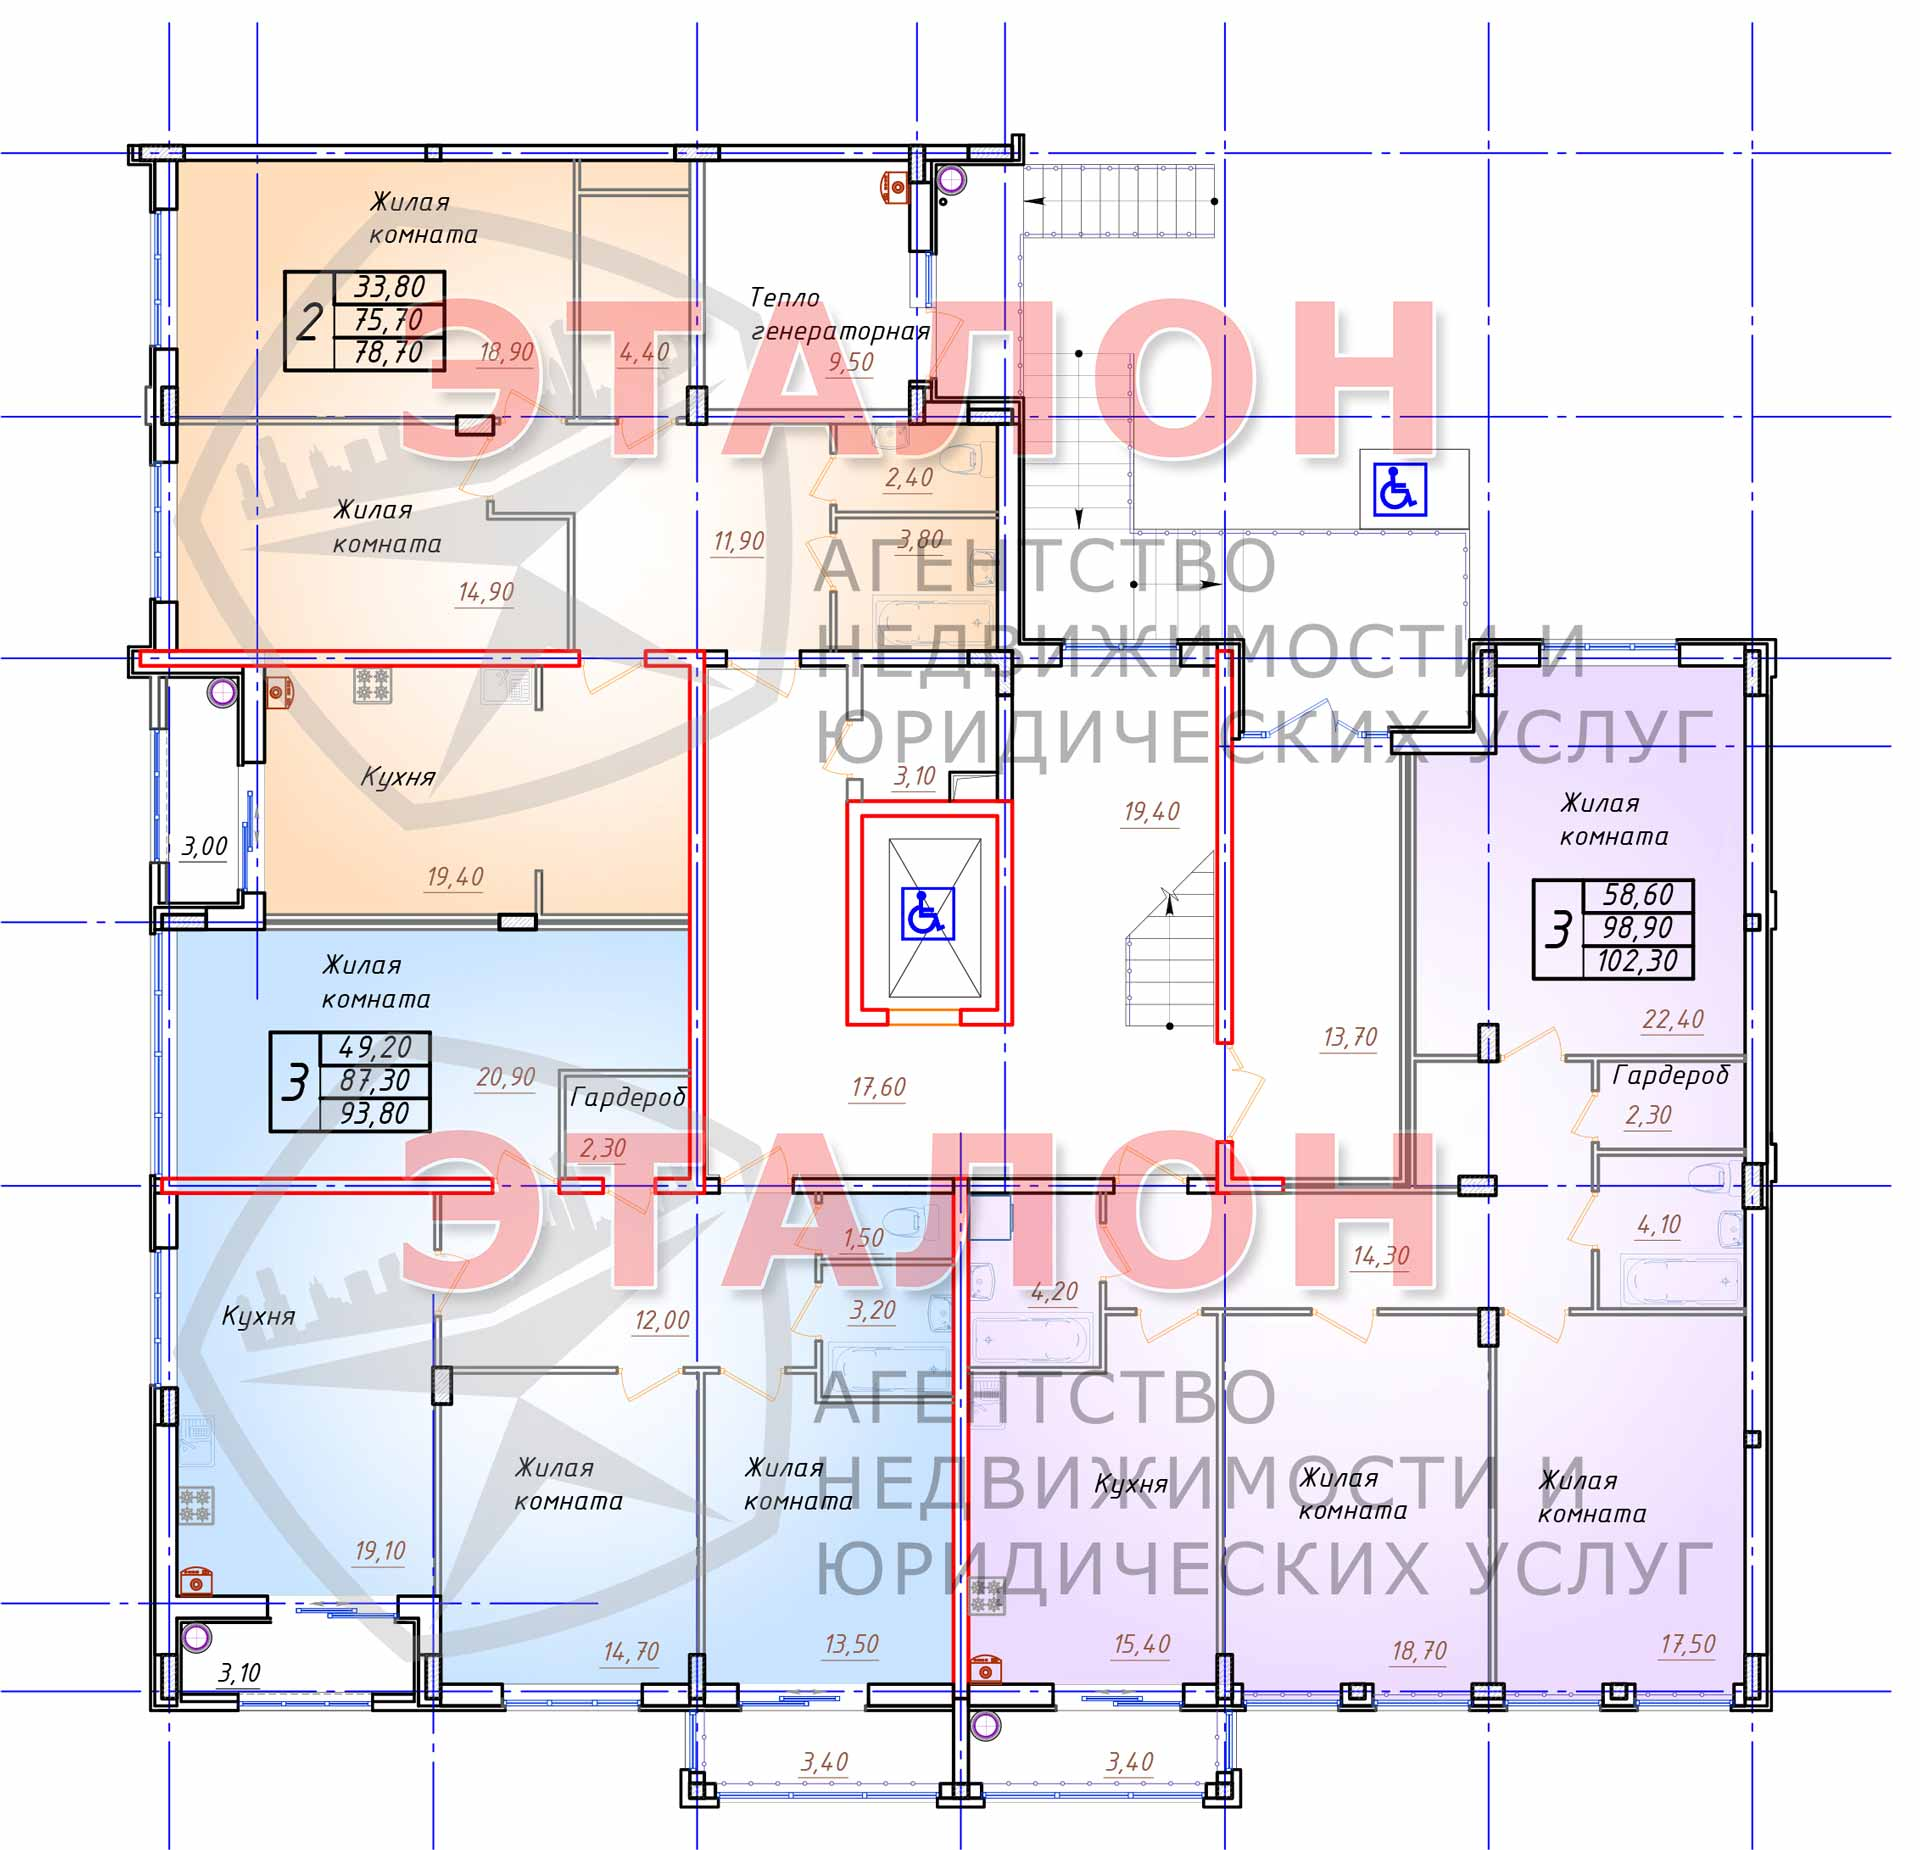 Блок 1. Подъезд 1. План 1-го этажа